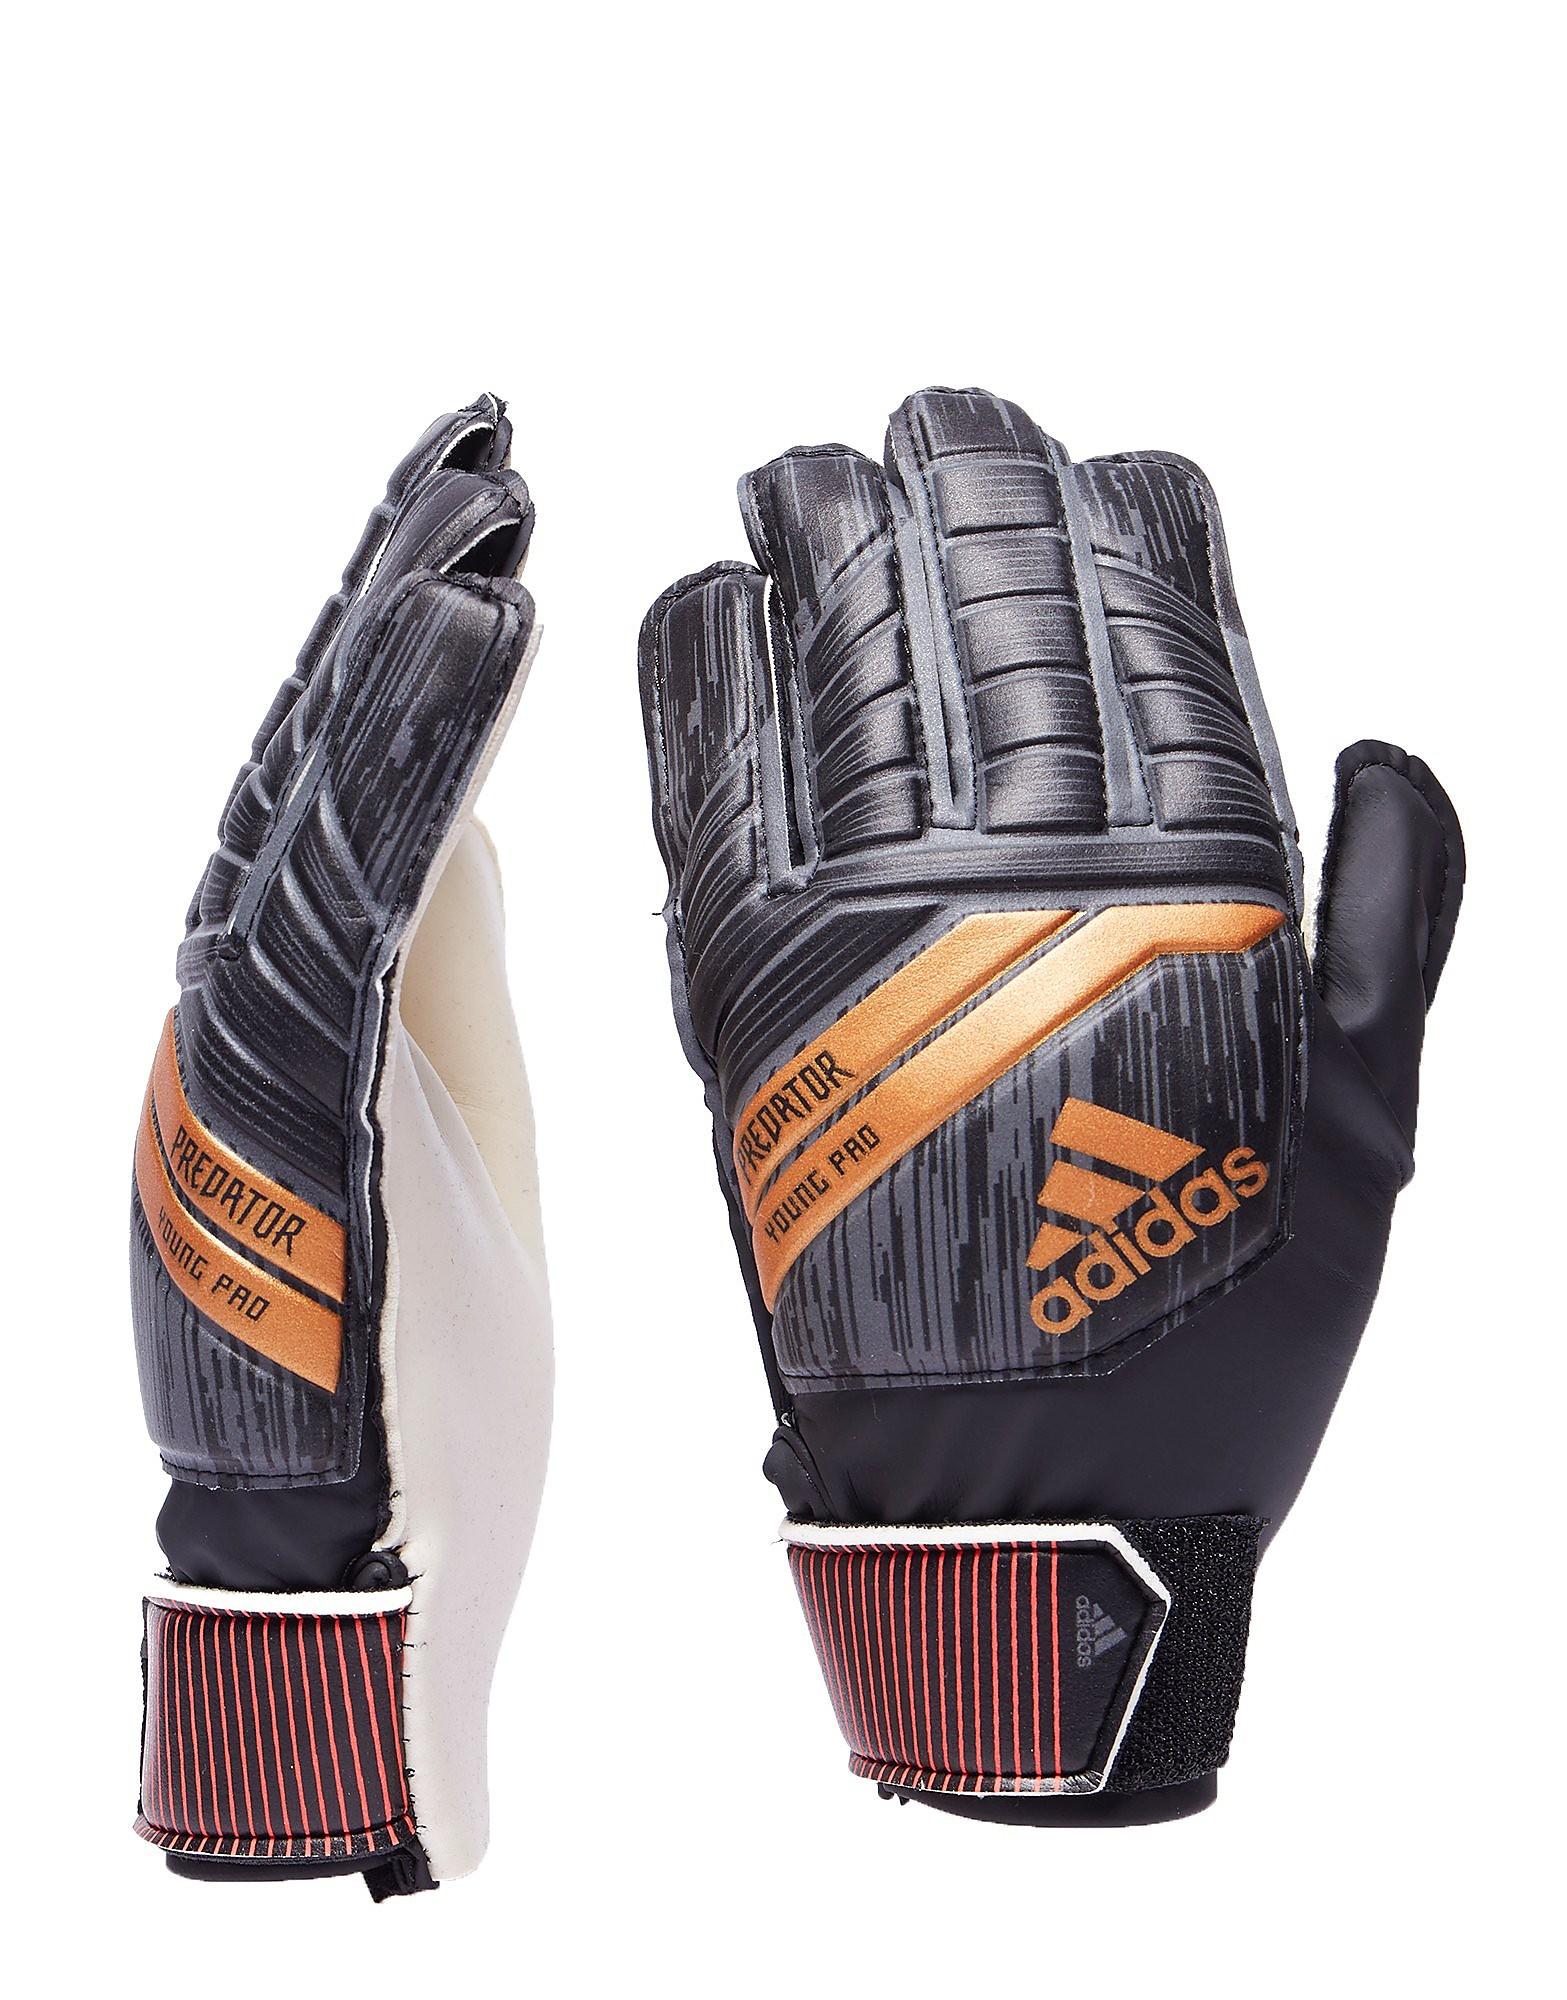 adidas guantes de portero Predator 18 Young Pro júnior